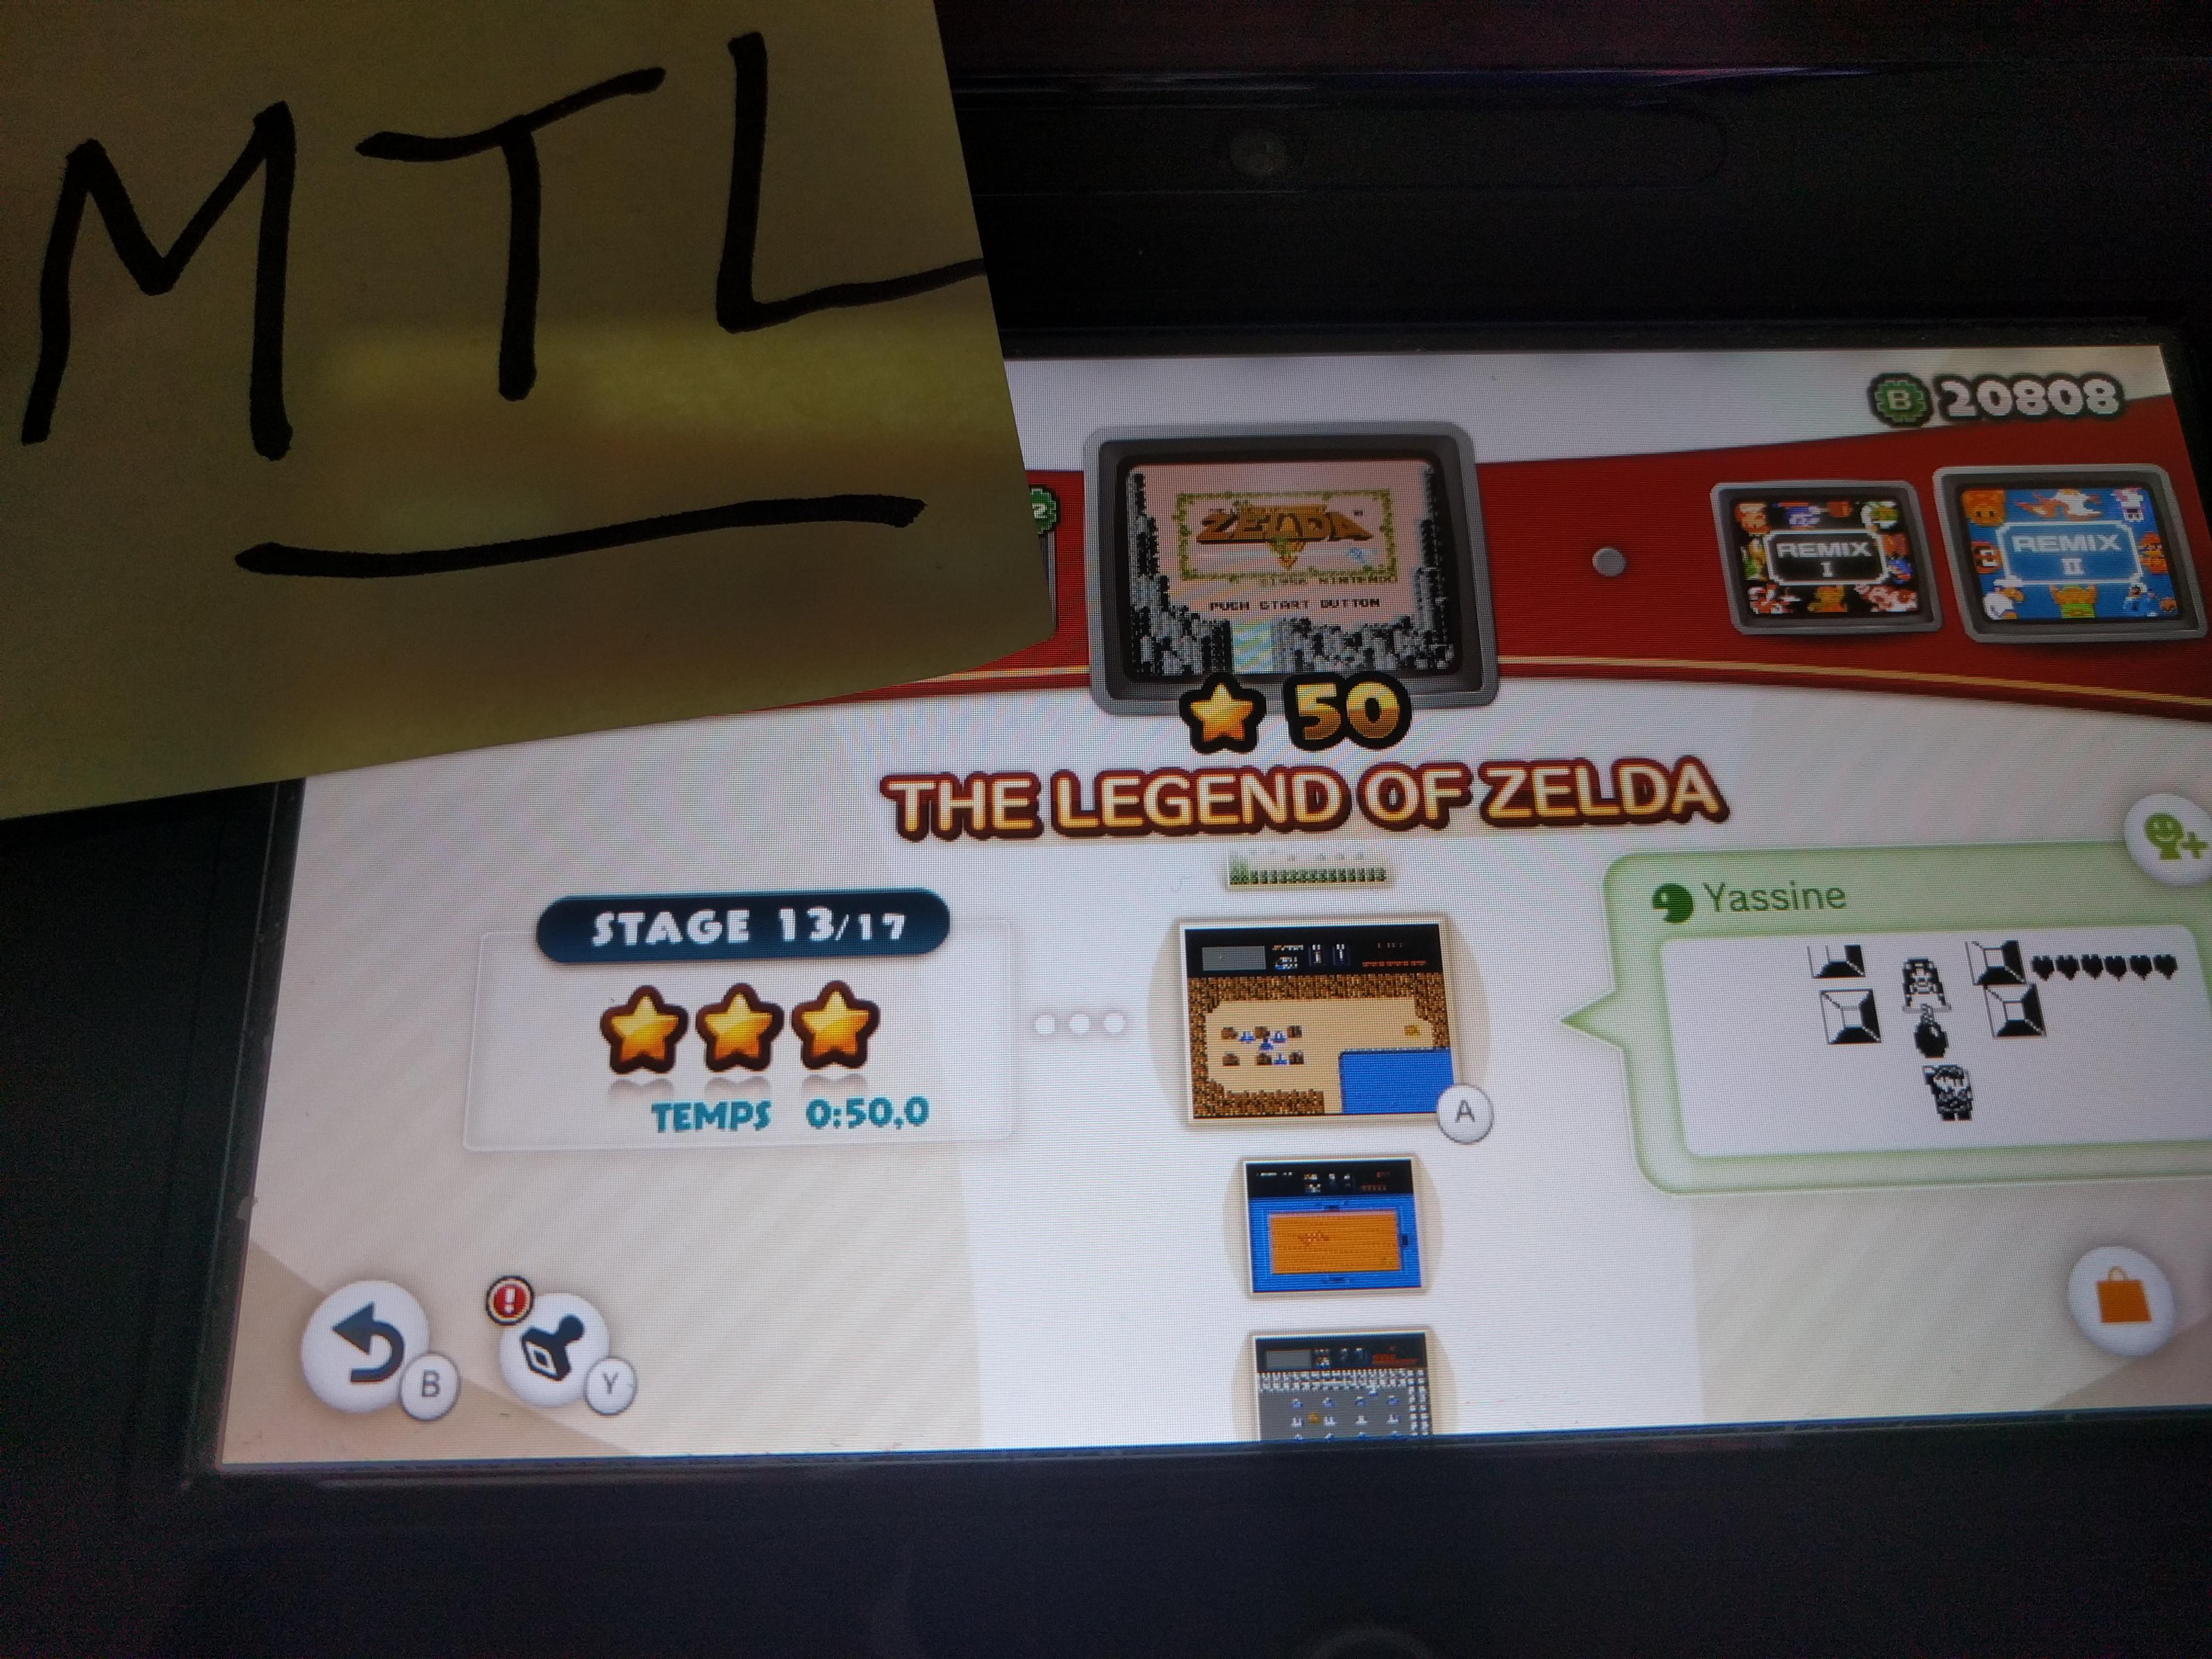 Mantalow: NES Remix: The Legend of Zelda: Stage 13 (Wii U) 0:00:50 points on 2016-06-10 19:11:53